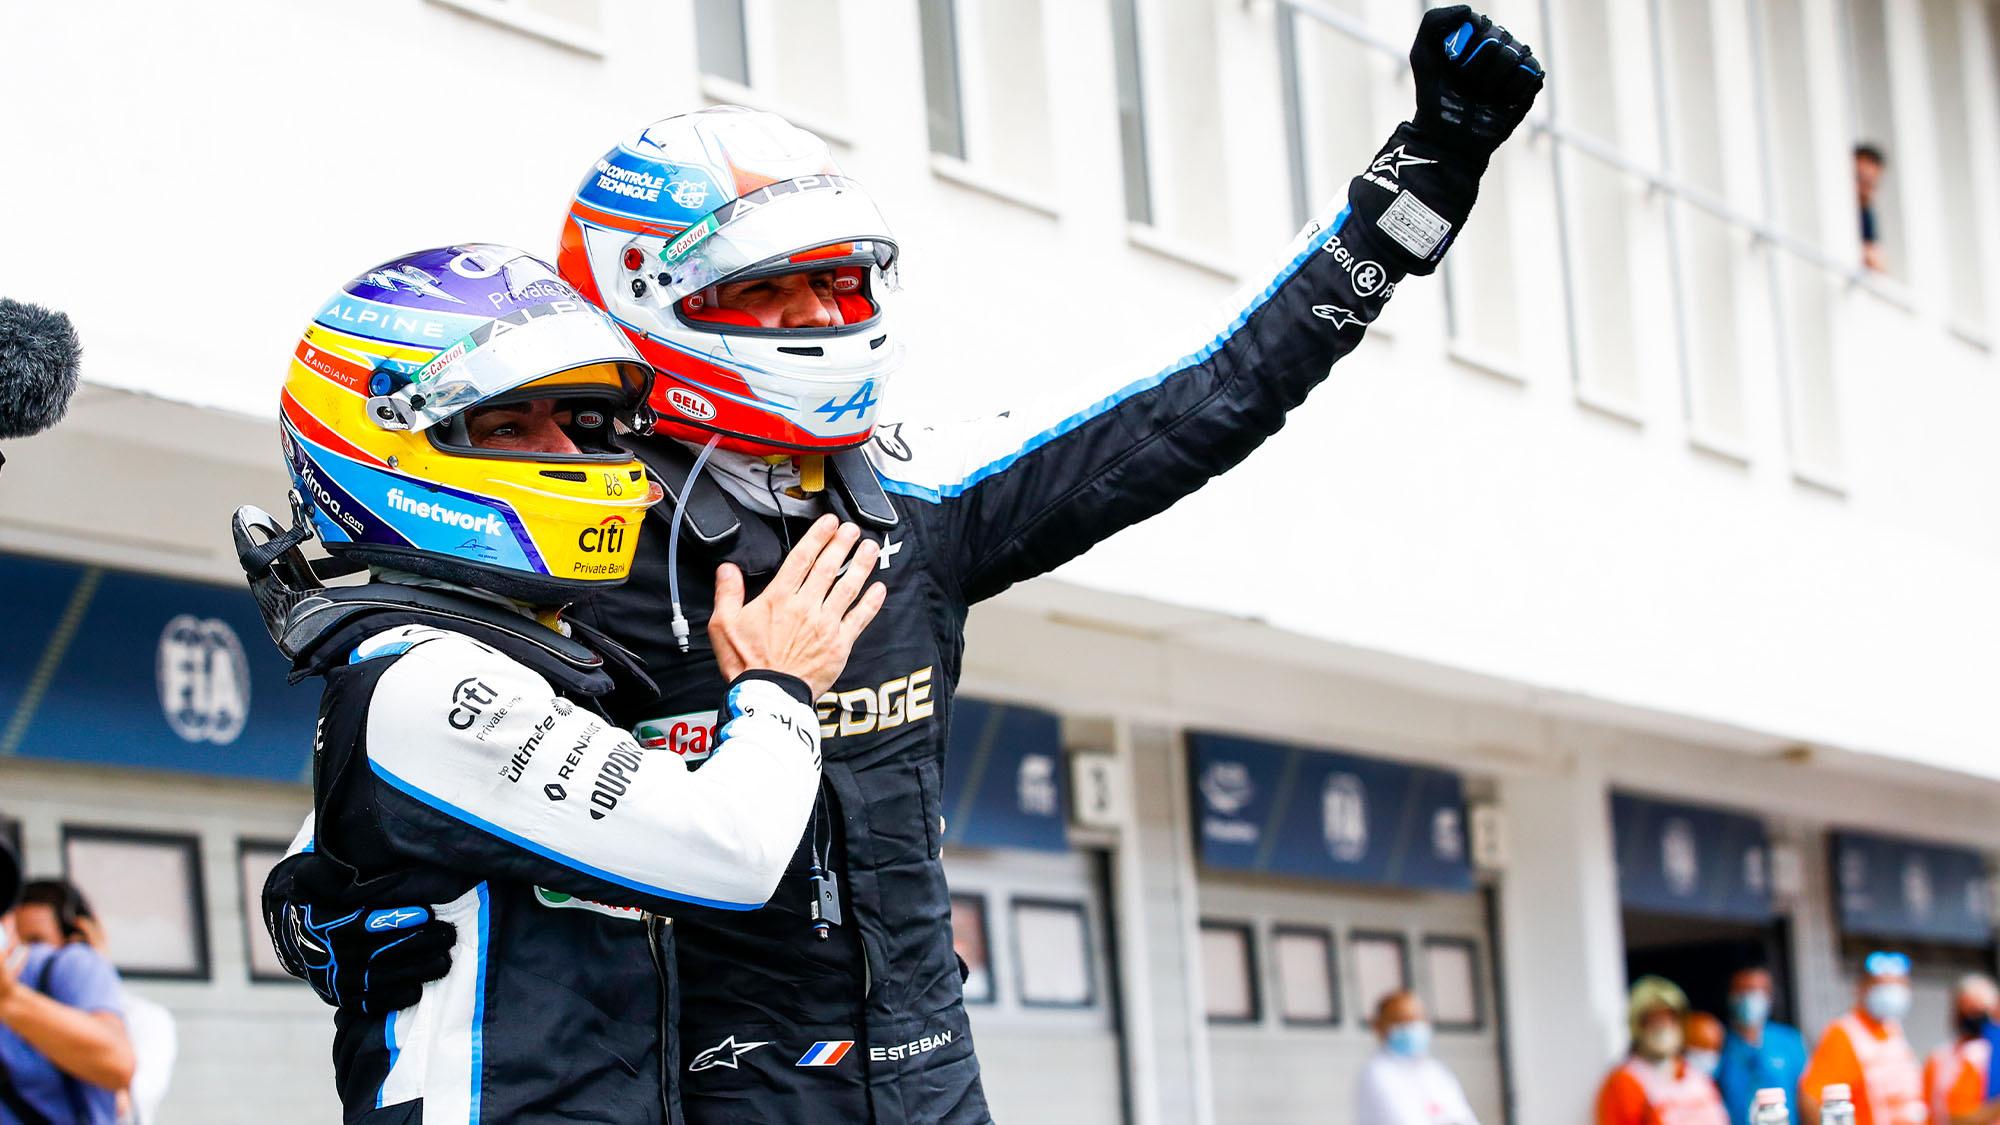 Fernando Alonso and Estebn Ocon after the 2021 Hungarian Grand Prix